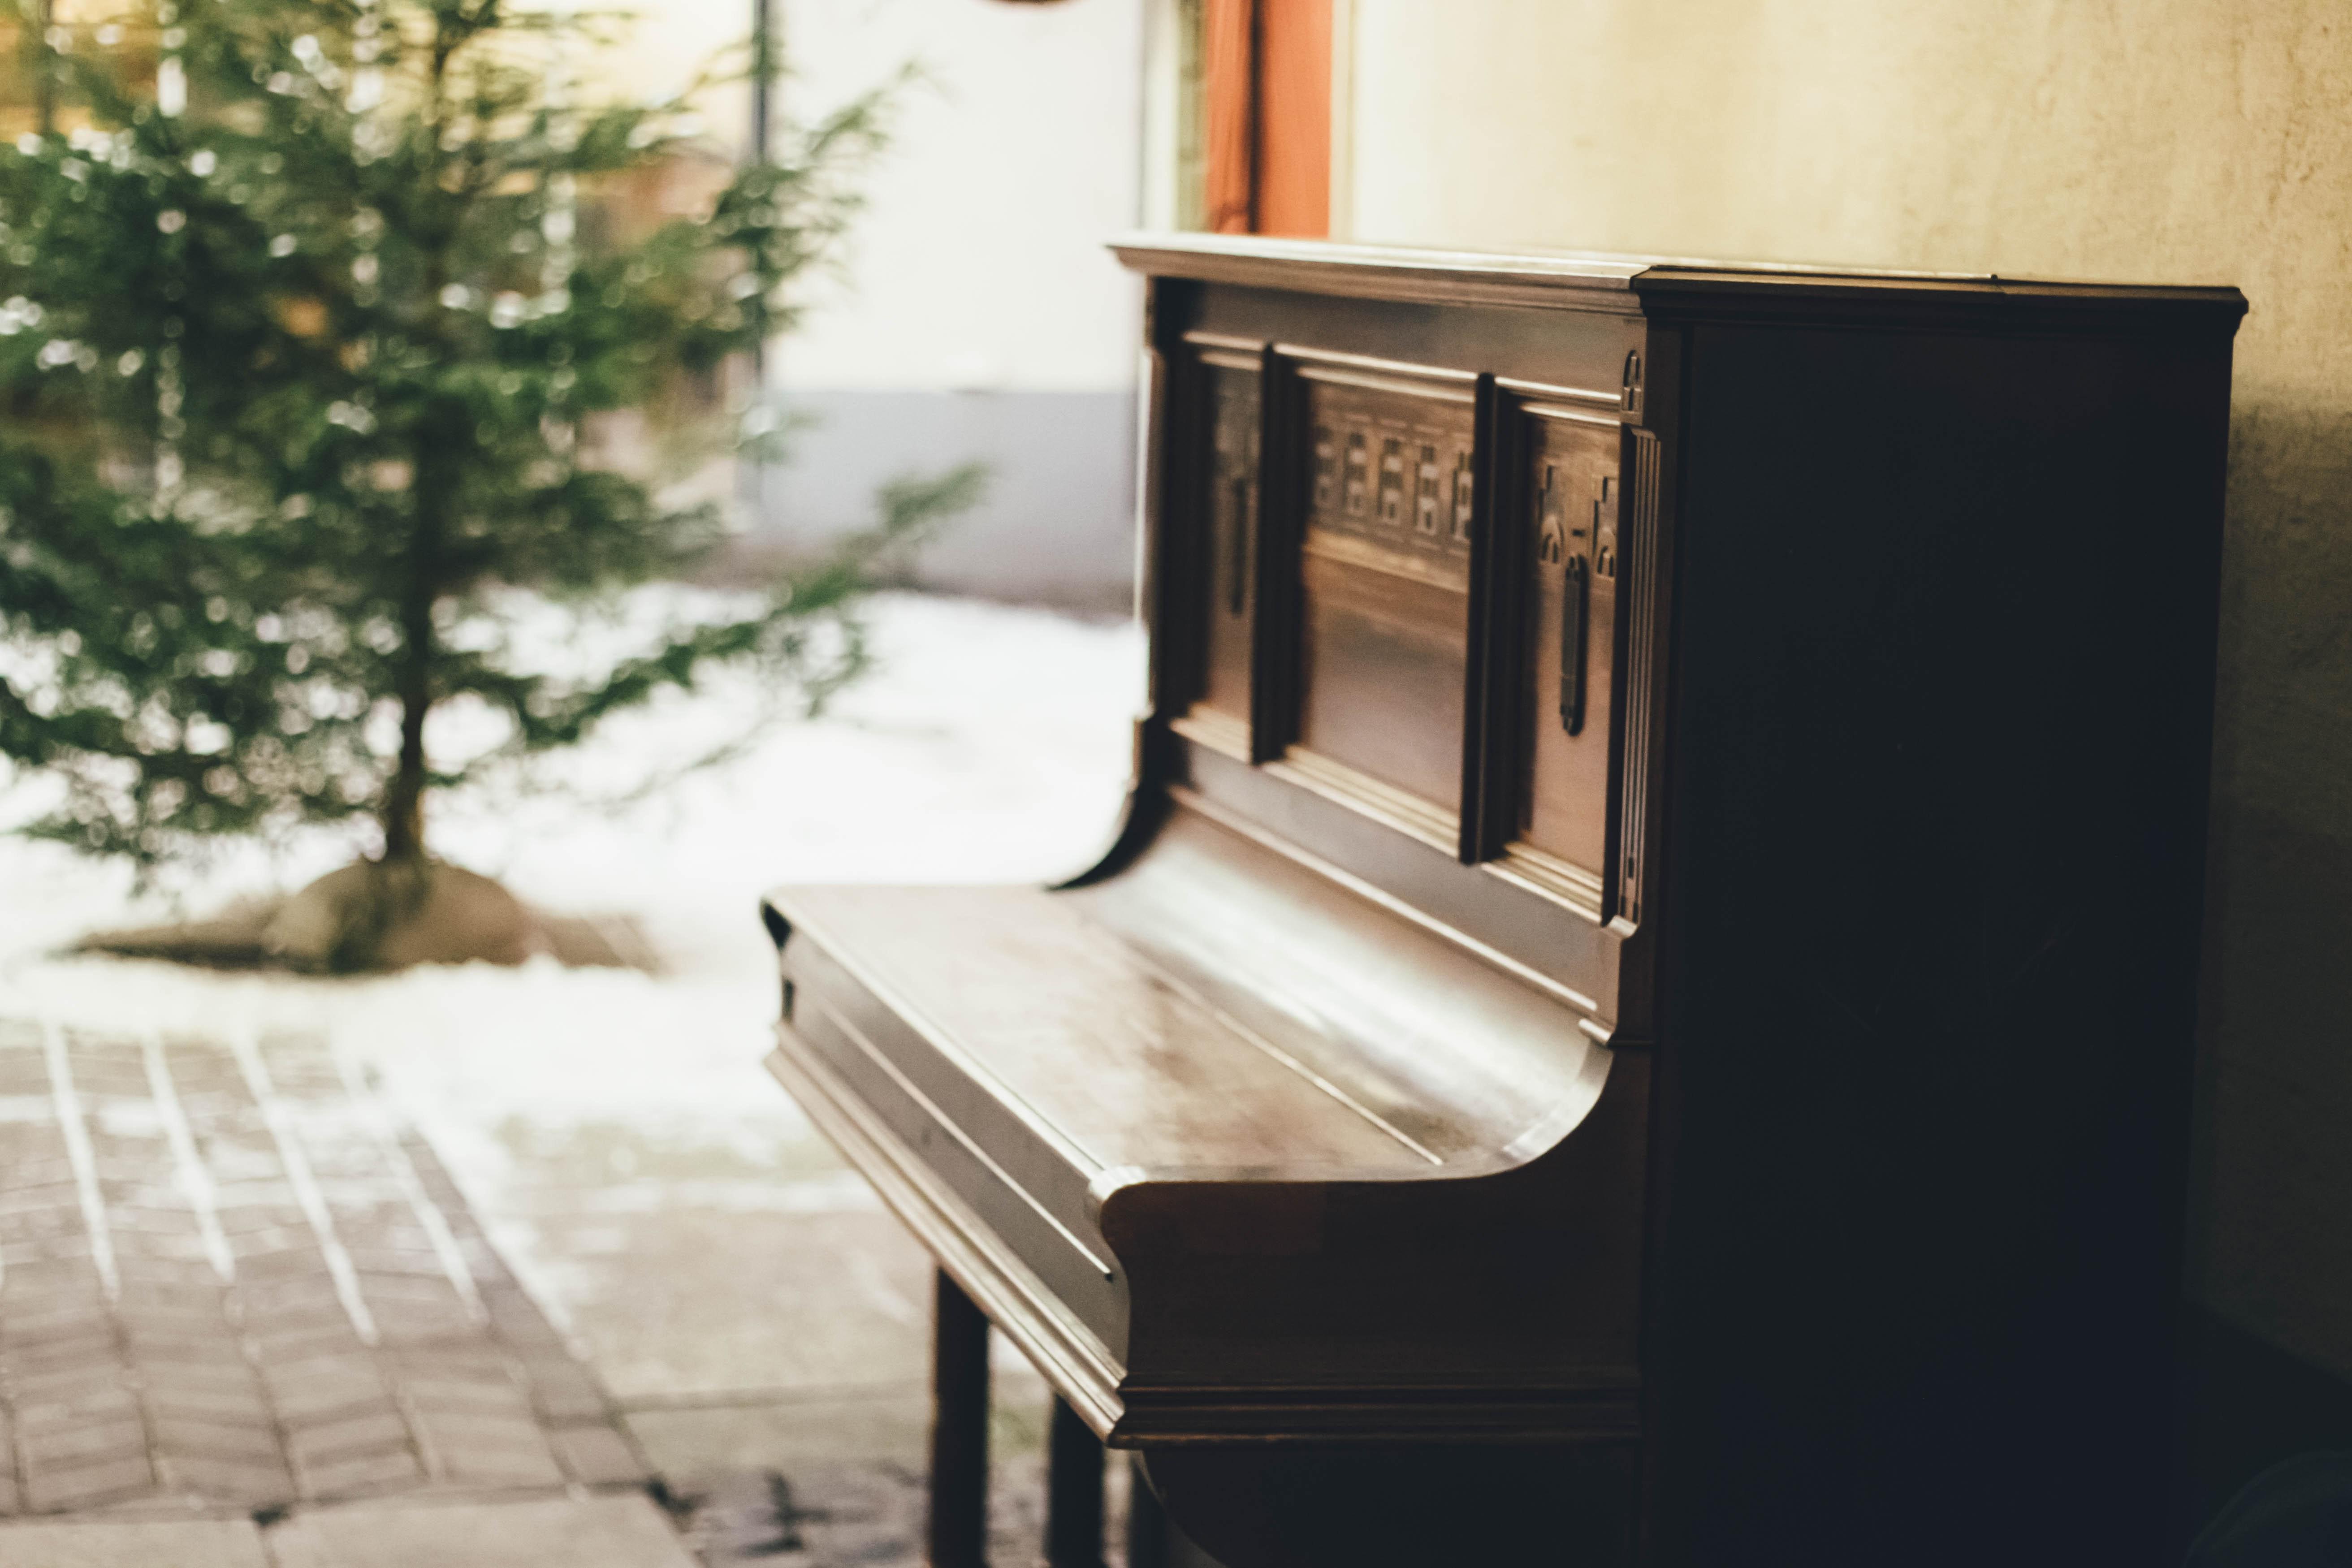 Opretstående klaver i gård